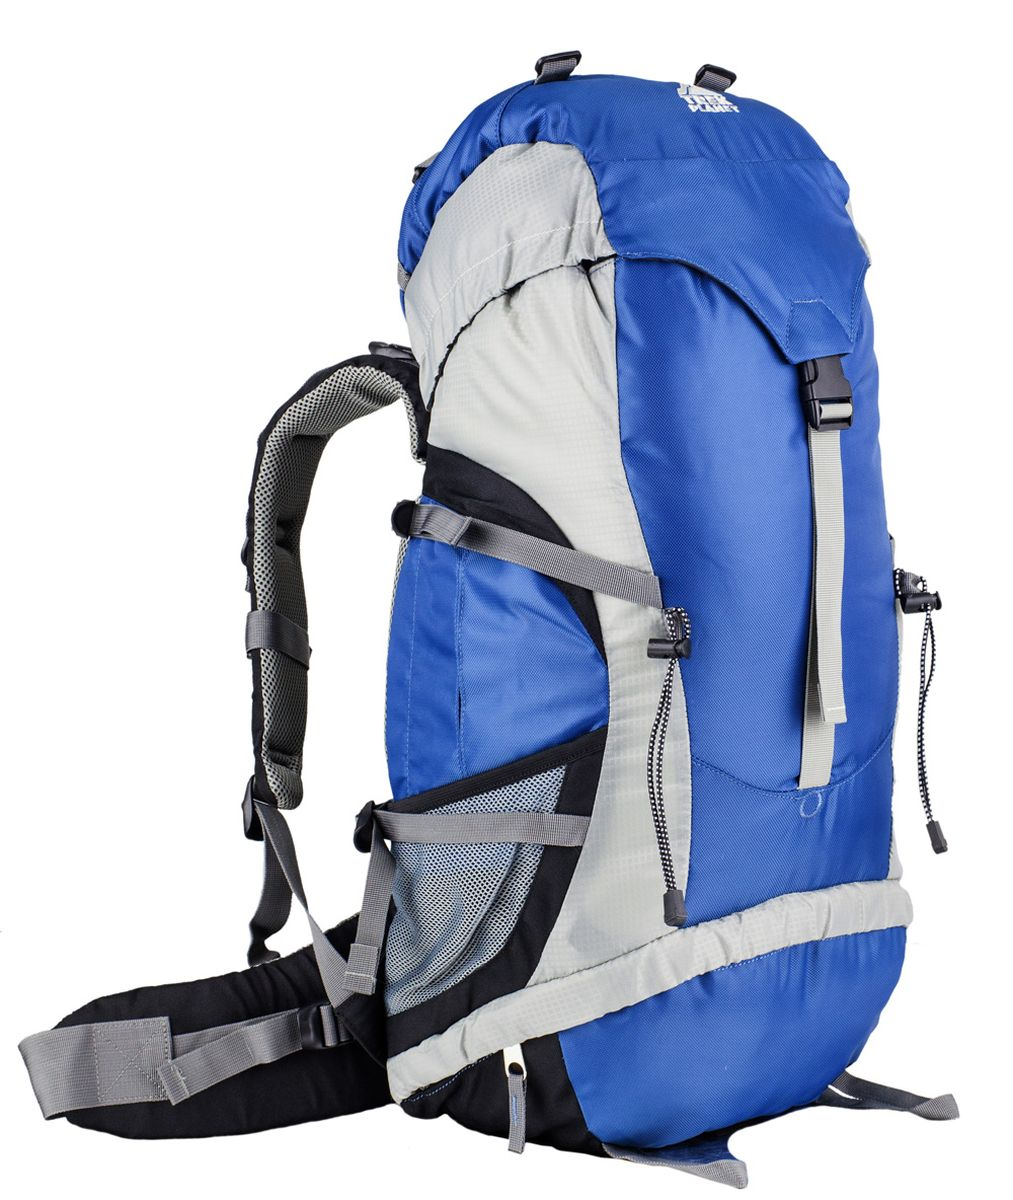 Рюкзак туристический Trek Planet Move 45, цвет: синий